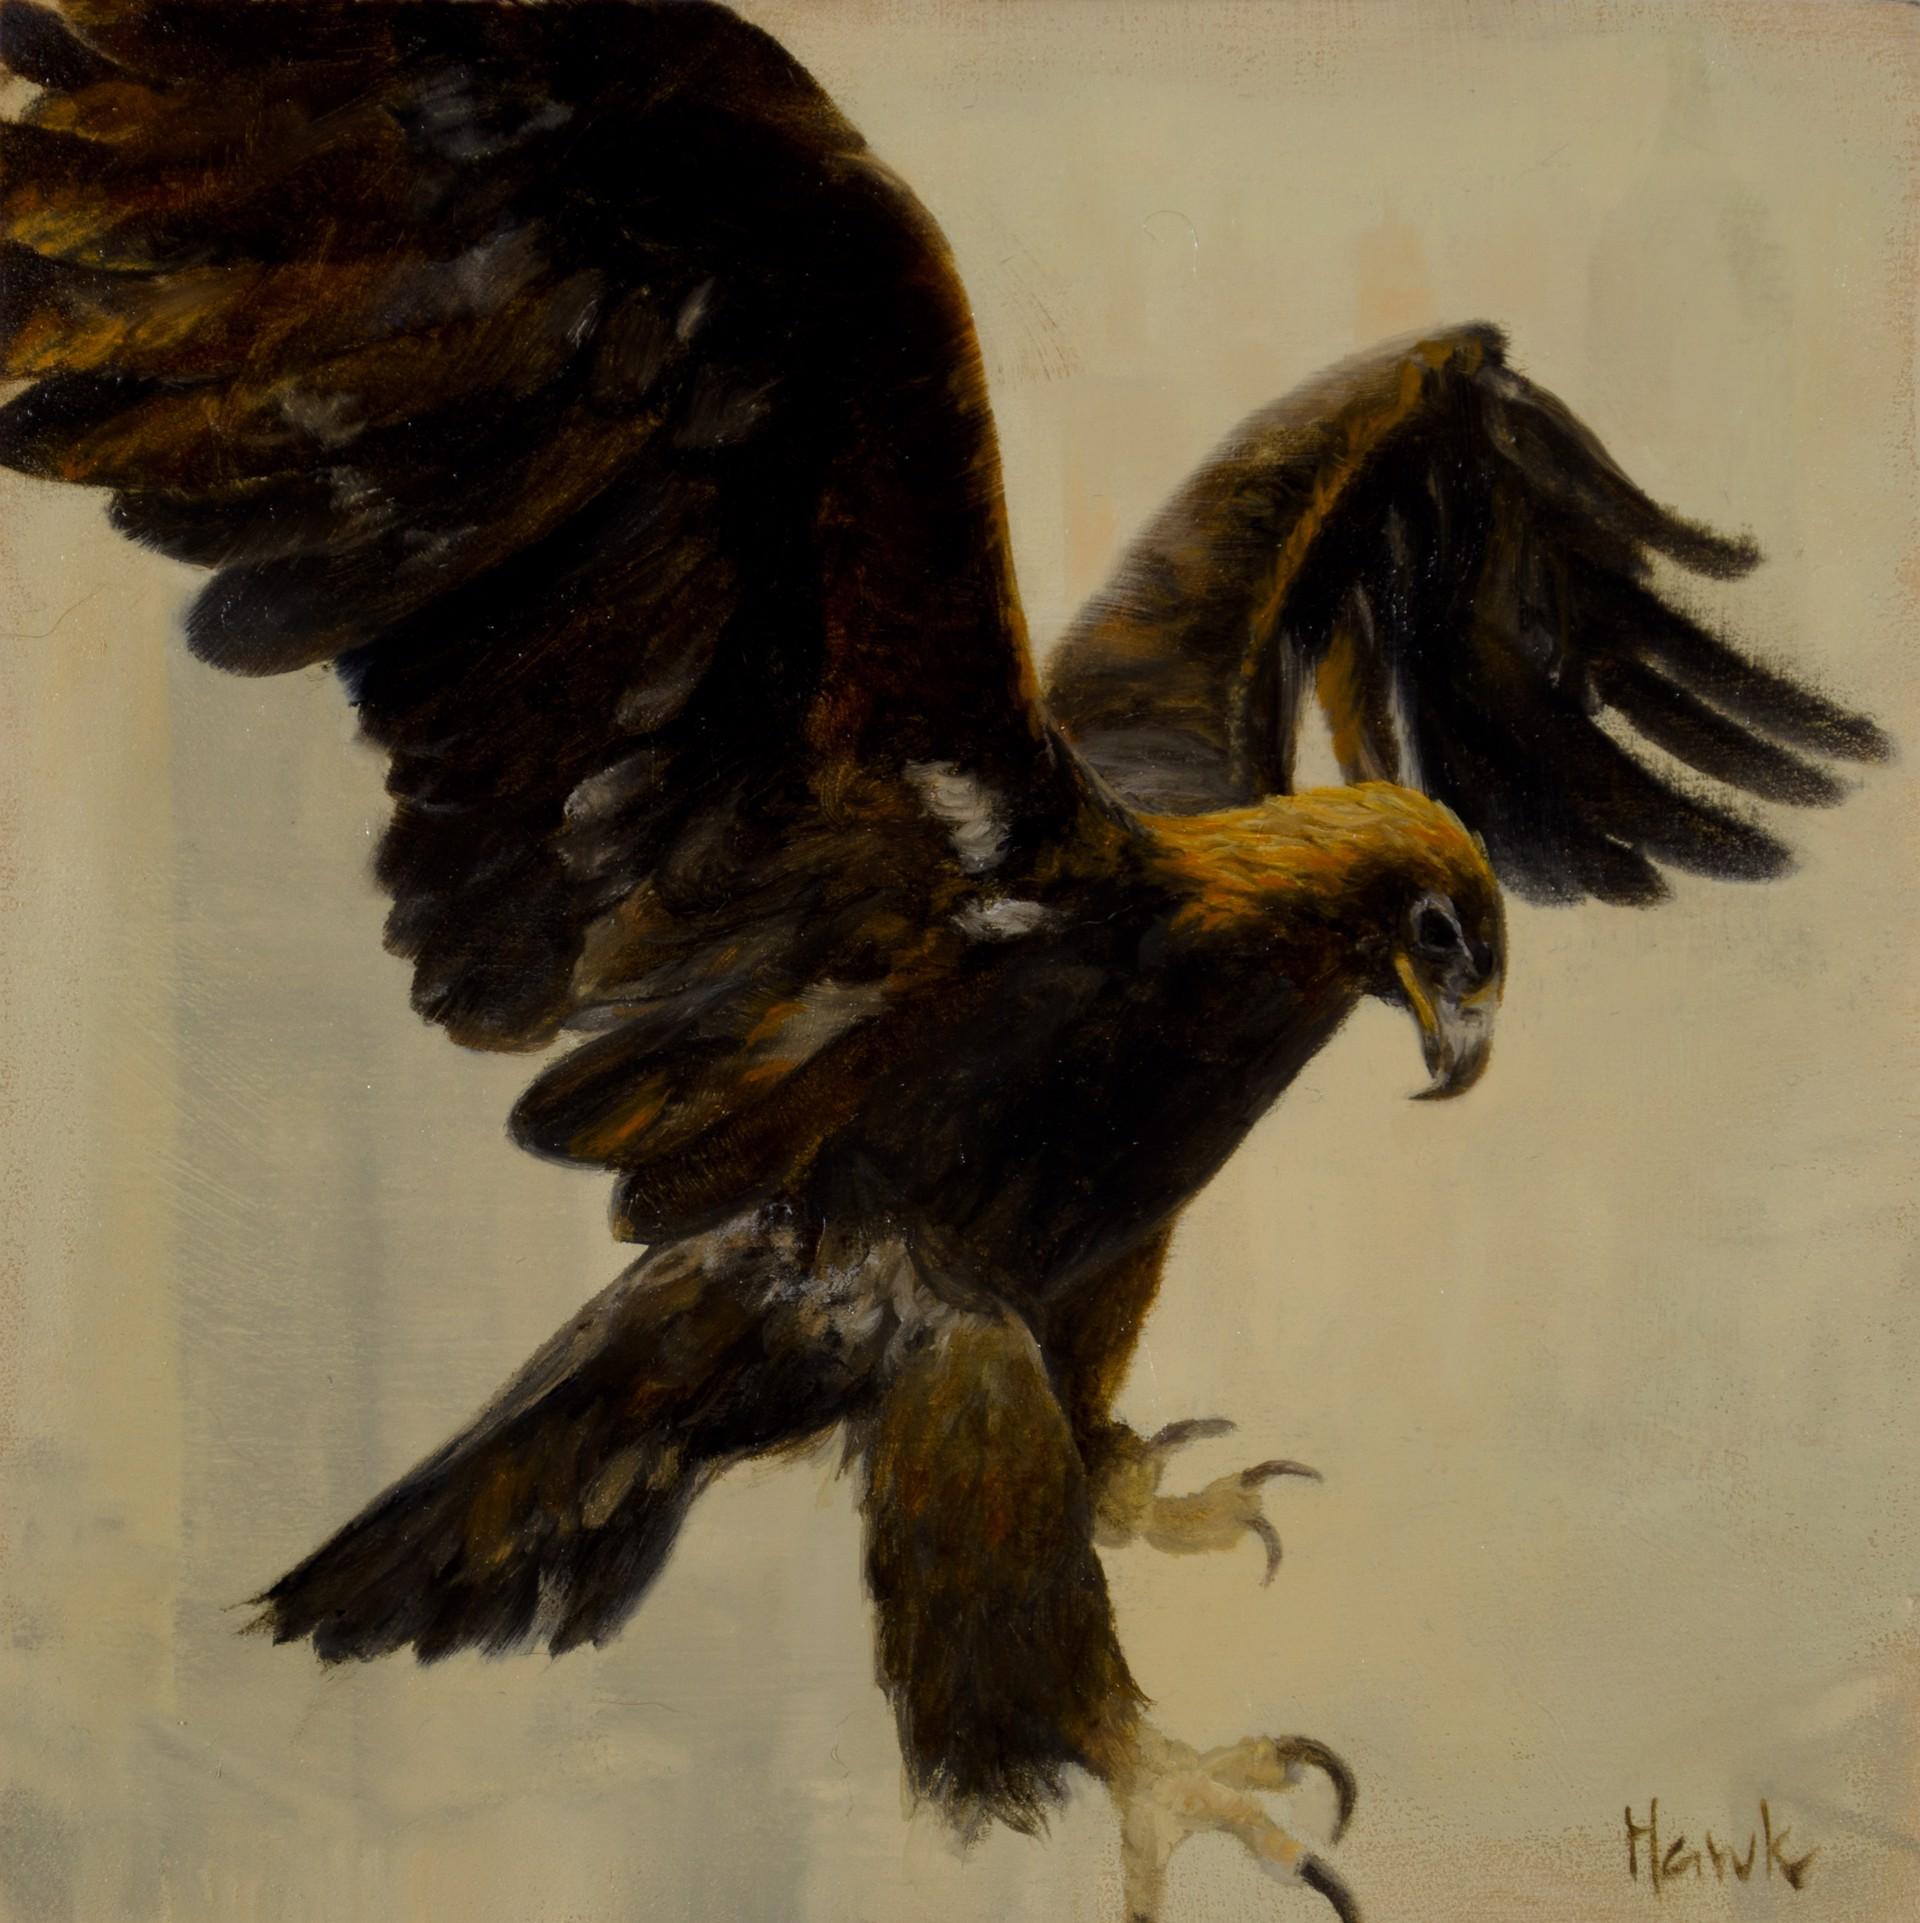 City Eagle by Dana Hawk